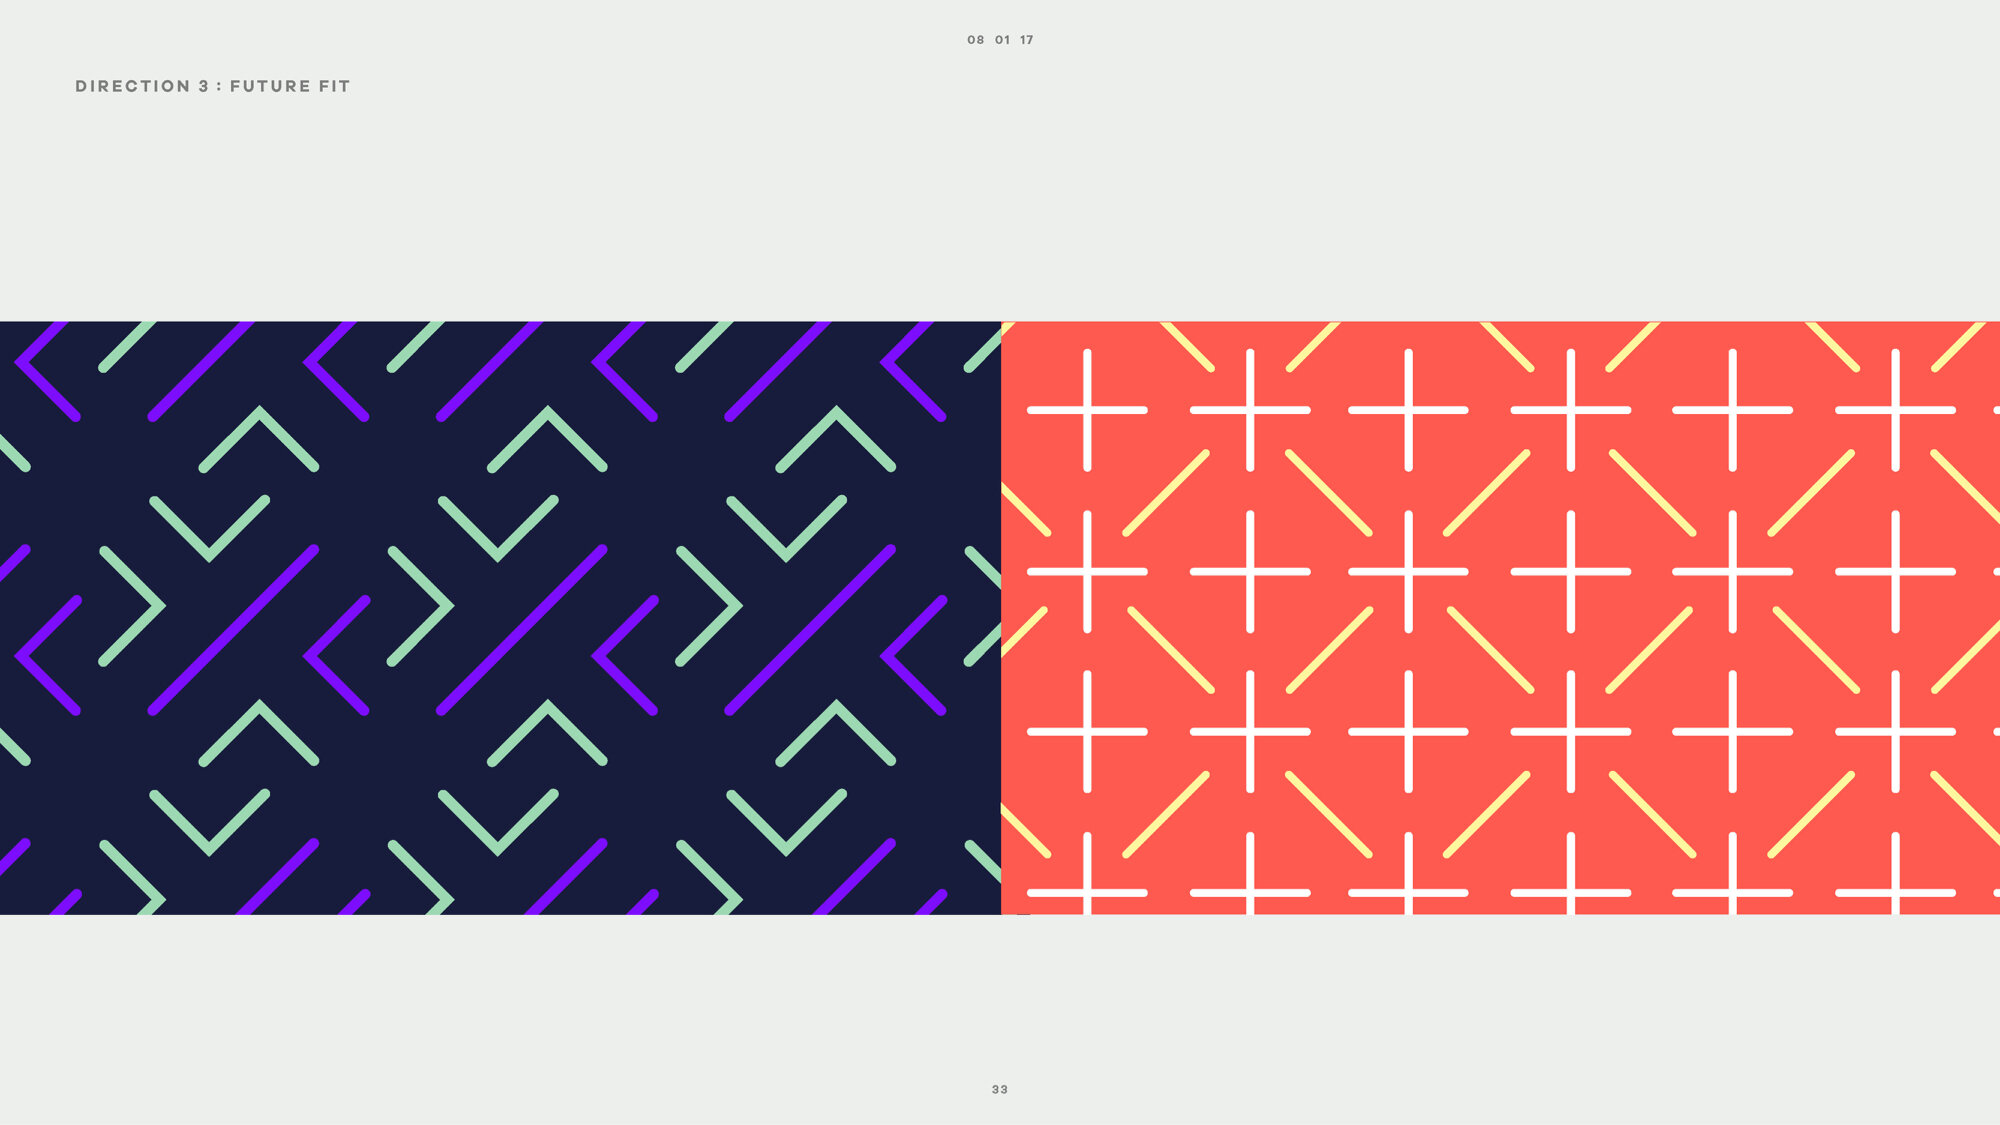 20170731_StudioMega_Katalyst_Brand_Design_Directions_PH1R2_Page_09.jpg